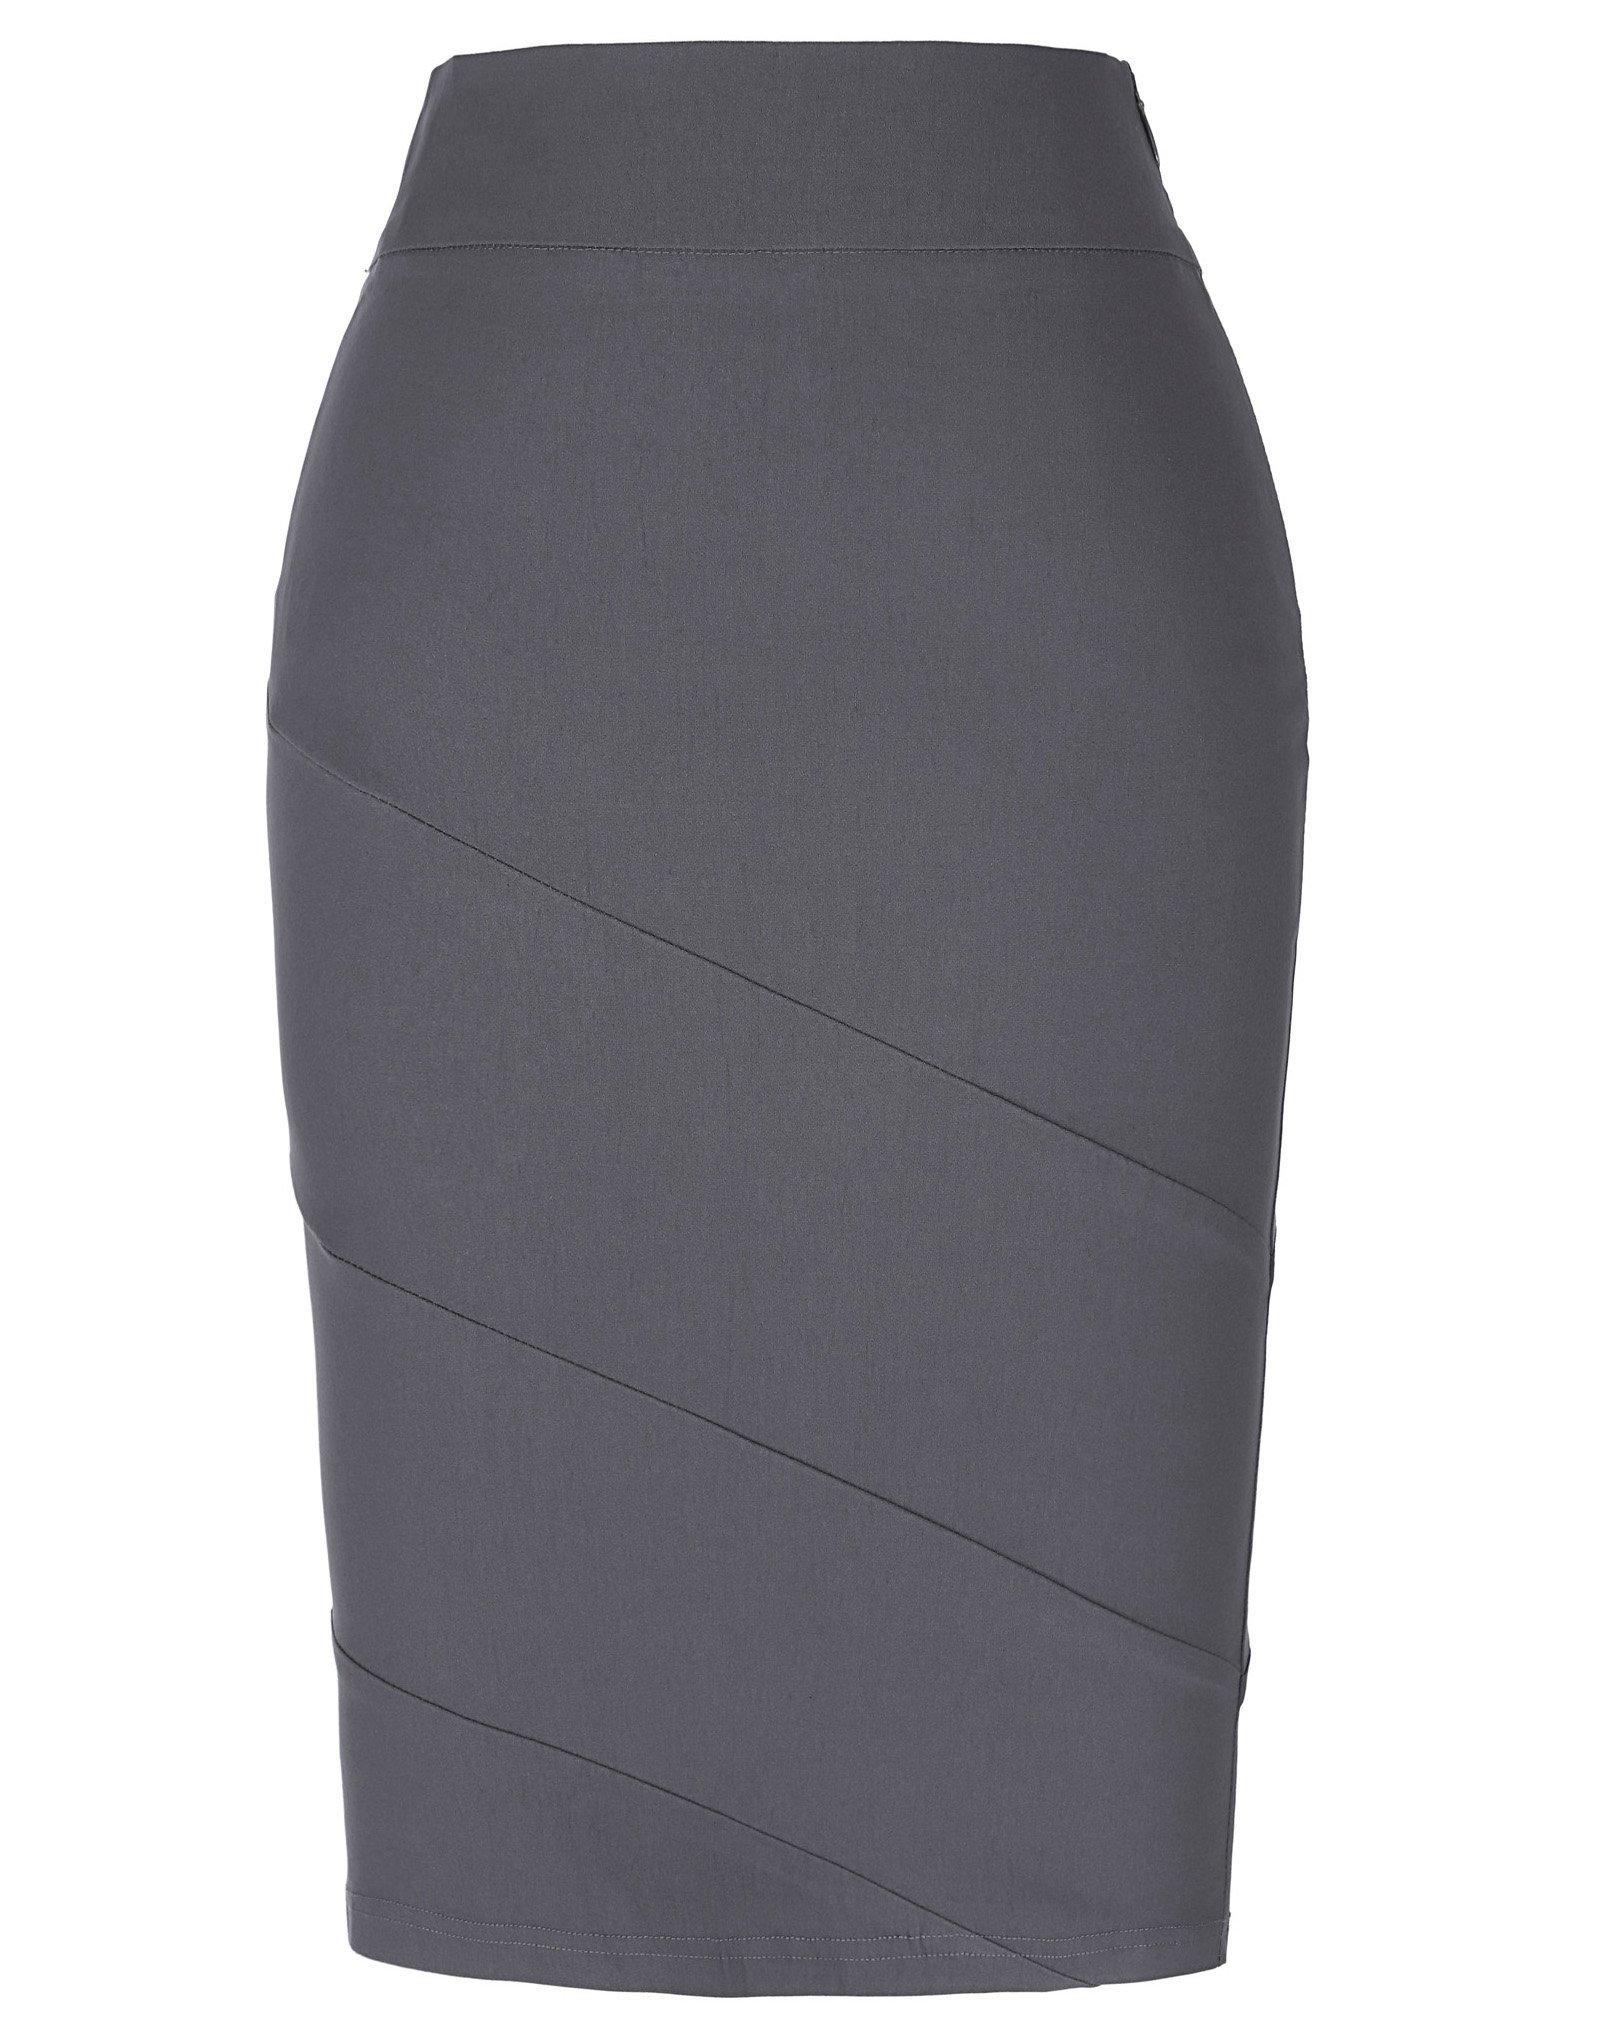 Kate Kasin Bodycon Wear to Work Stretchy Women Cotton Pencil Skirt XL KK269-2